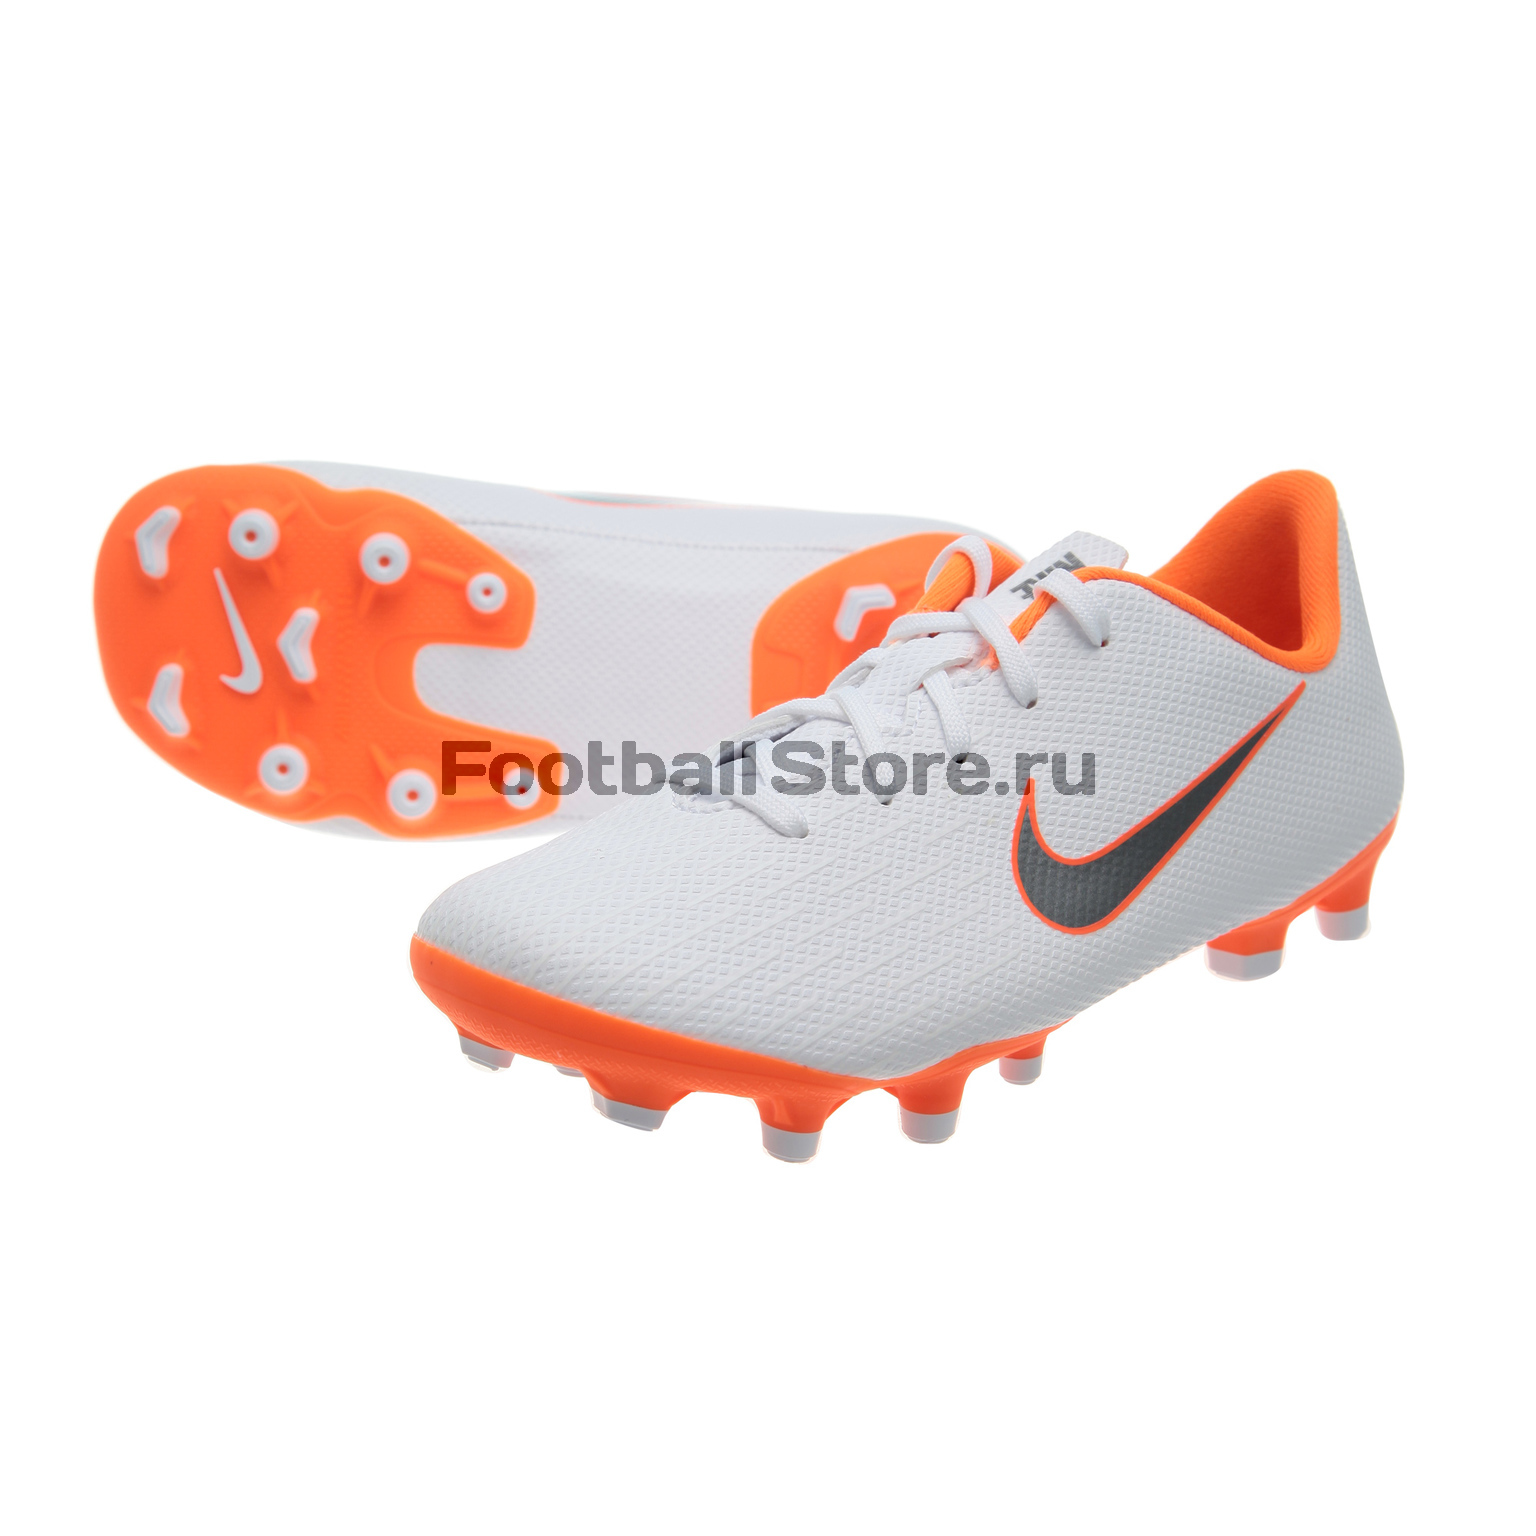 Бутсы детские Nike Vapor 12 Academy PS FG/MG AH7349-107 бутсы детские nike vapor 12 academy gs fg mg ah7347 070